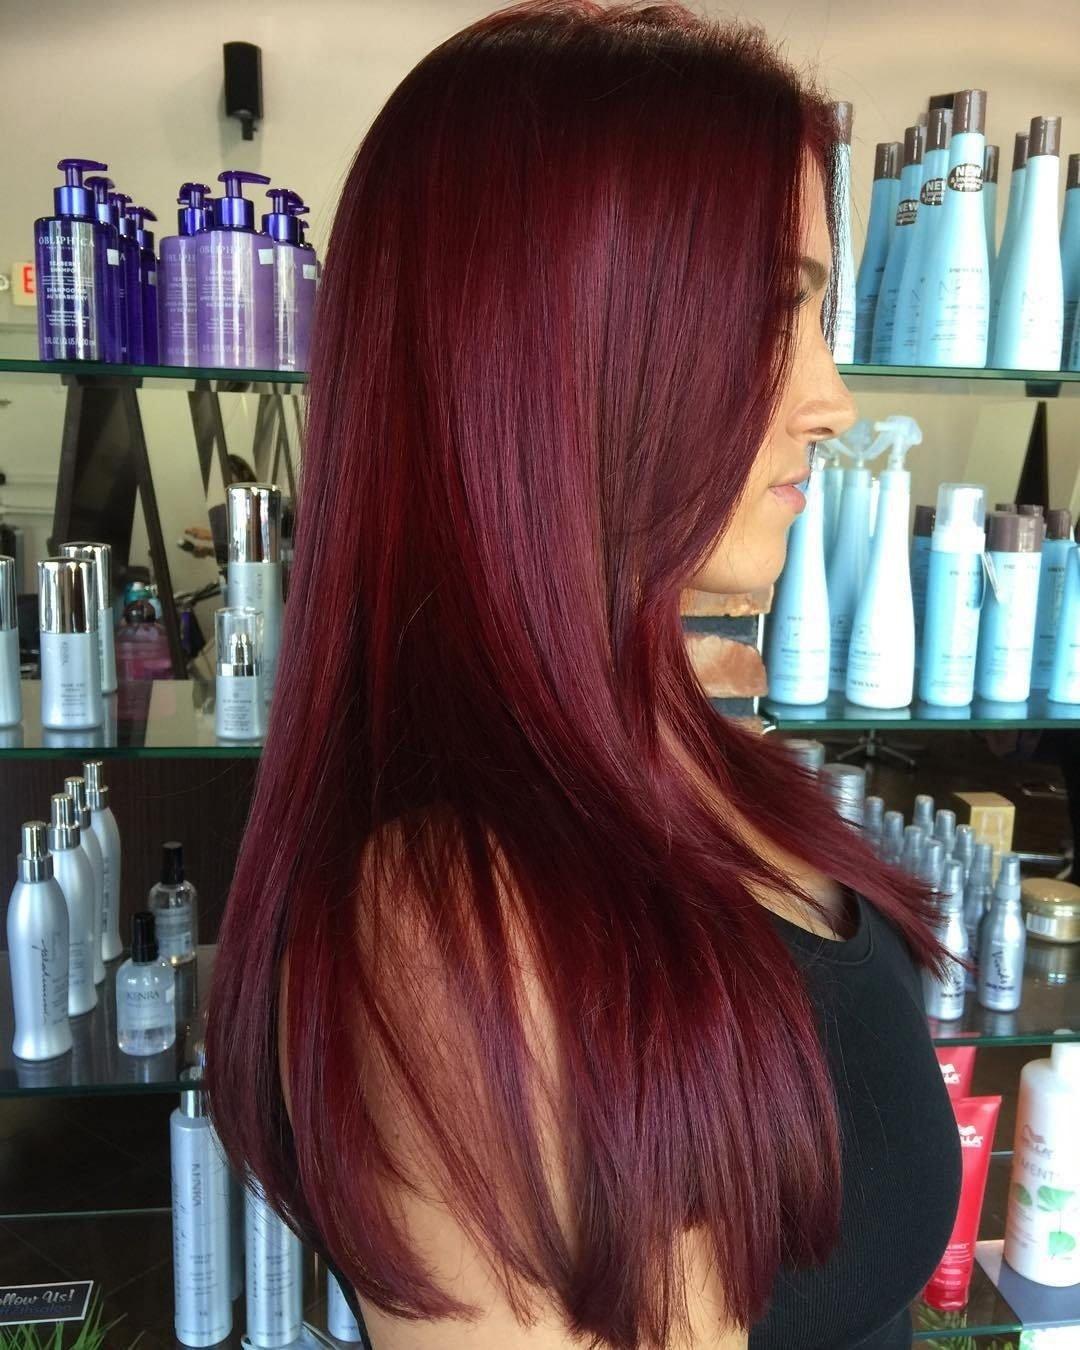 10 Spectacular Brown Red Hair Color Ideas dark red violet hair color best hair color for brown green eyes 2020